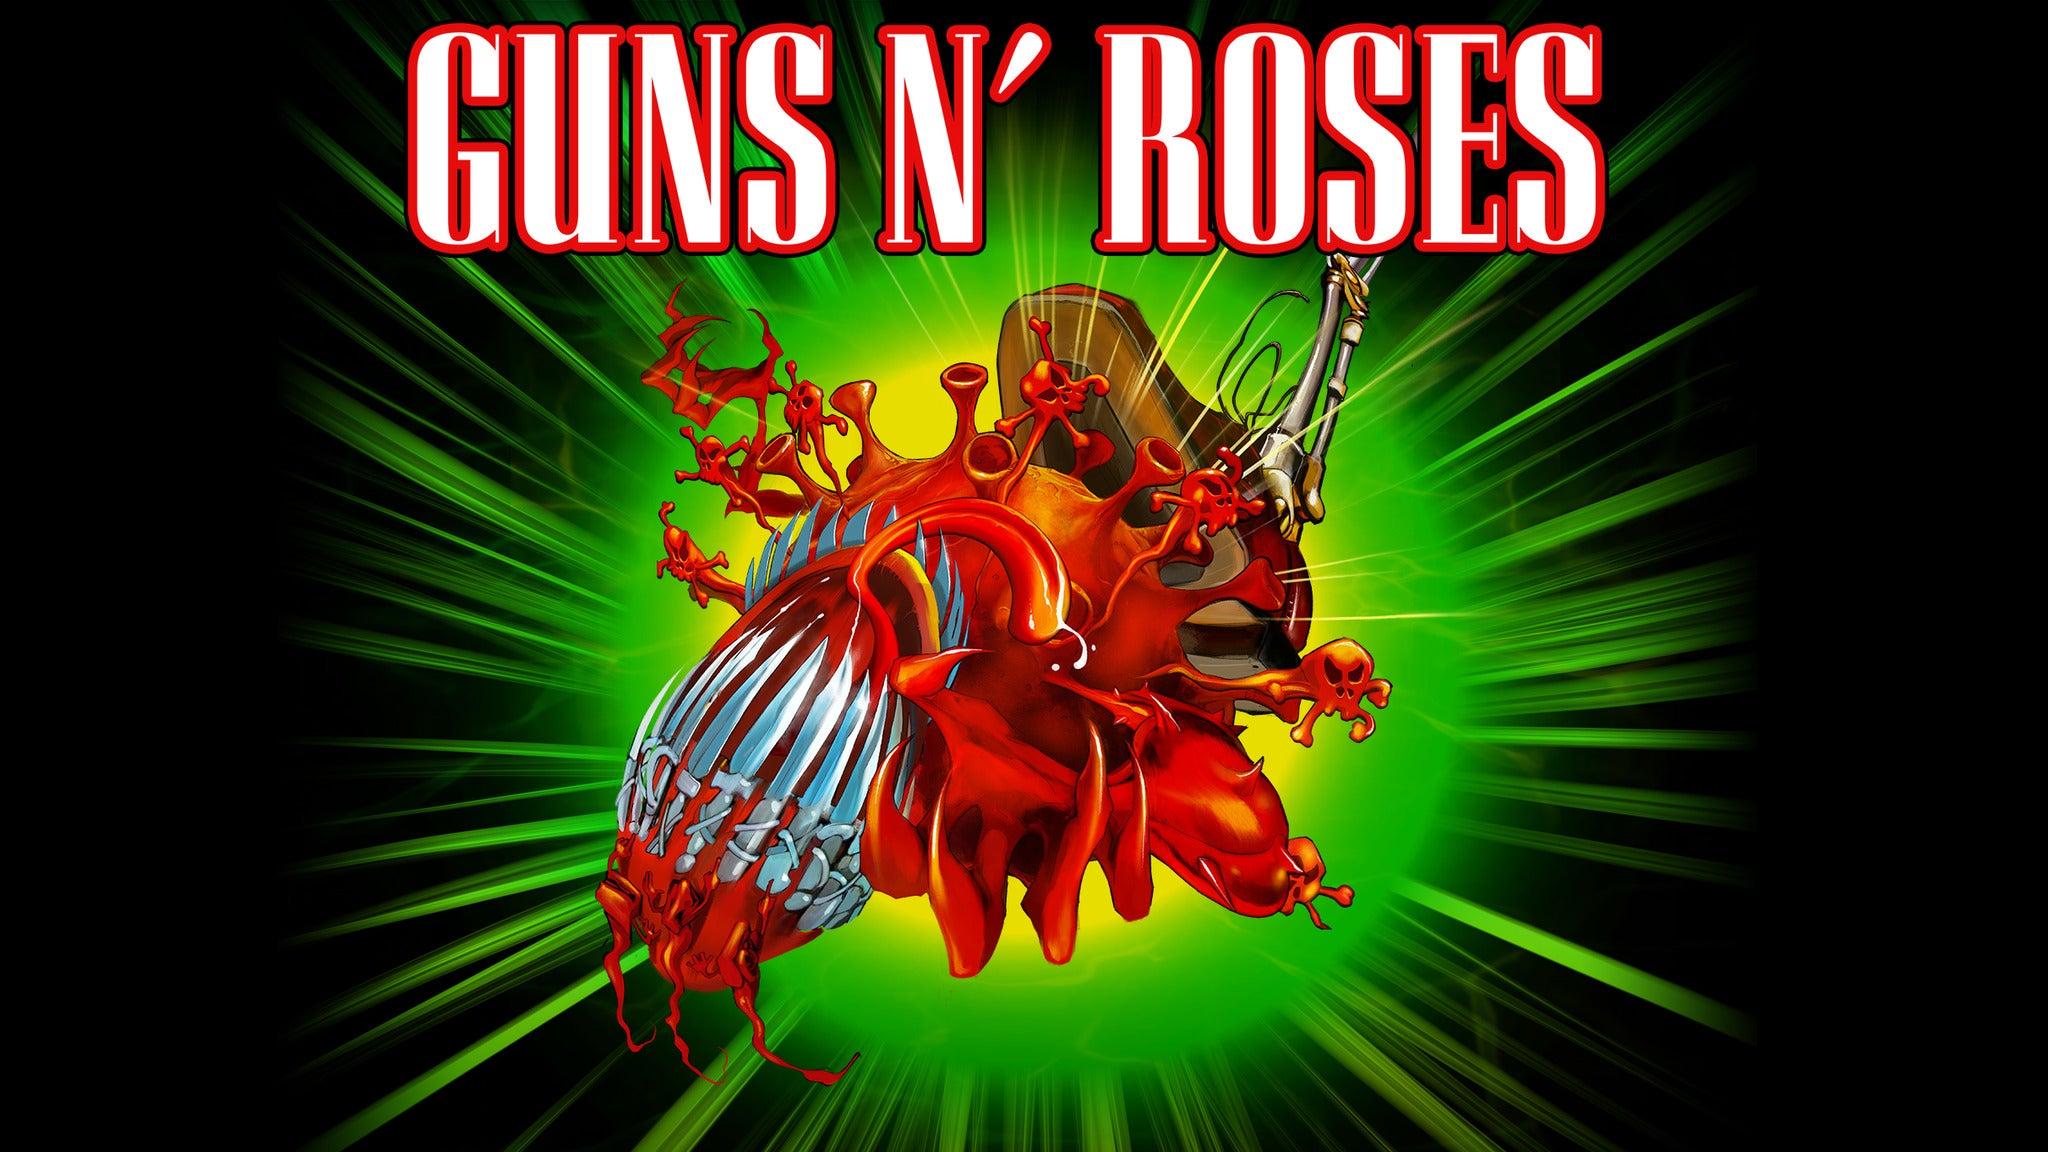 Guns N' Roses 2021 Tour pre-sale password